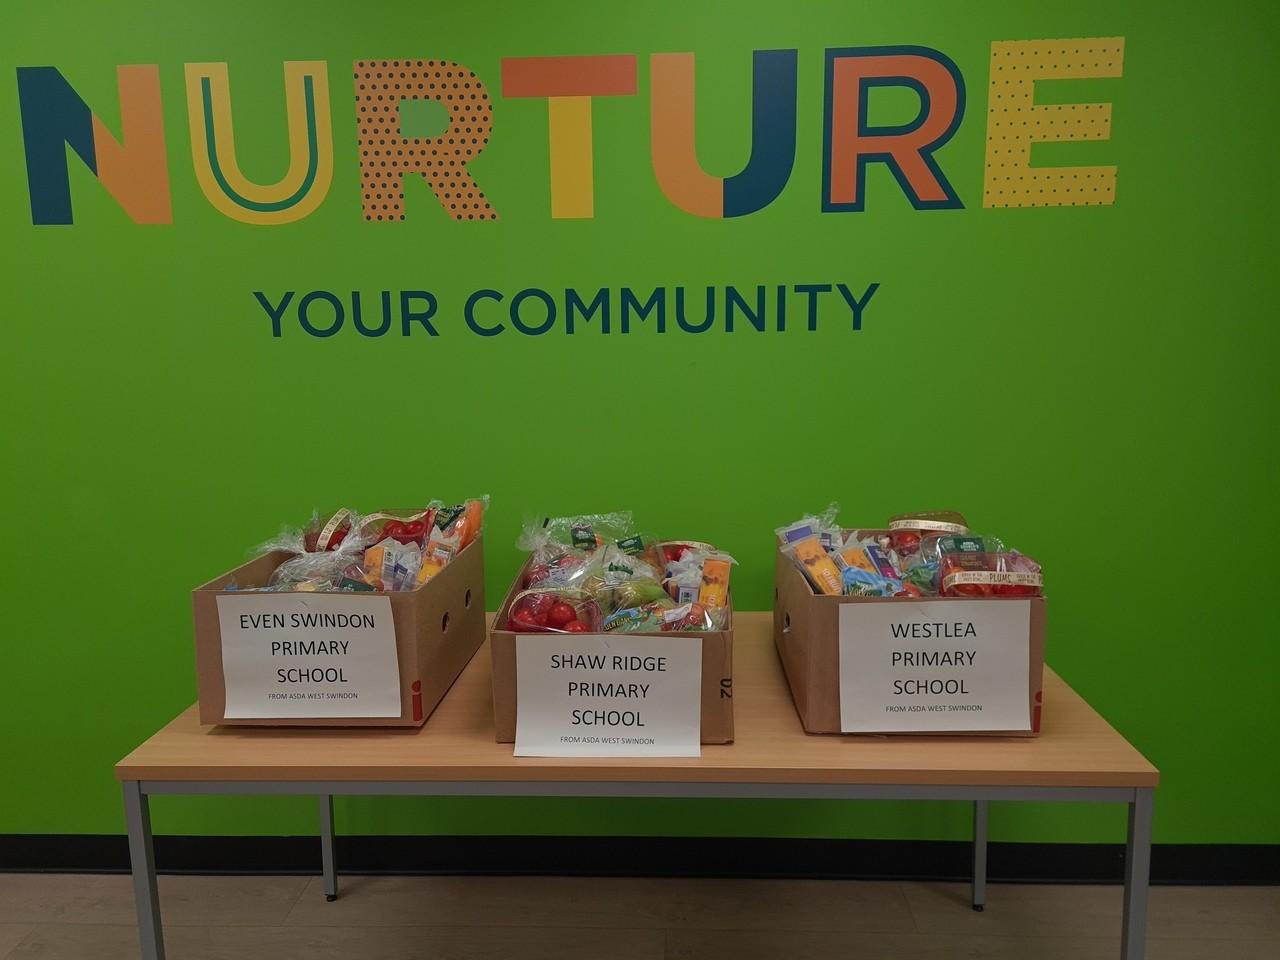 Helping the local schools | Asda West Swindon